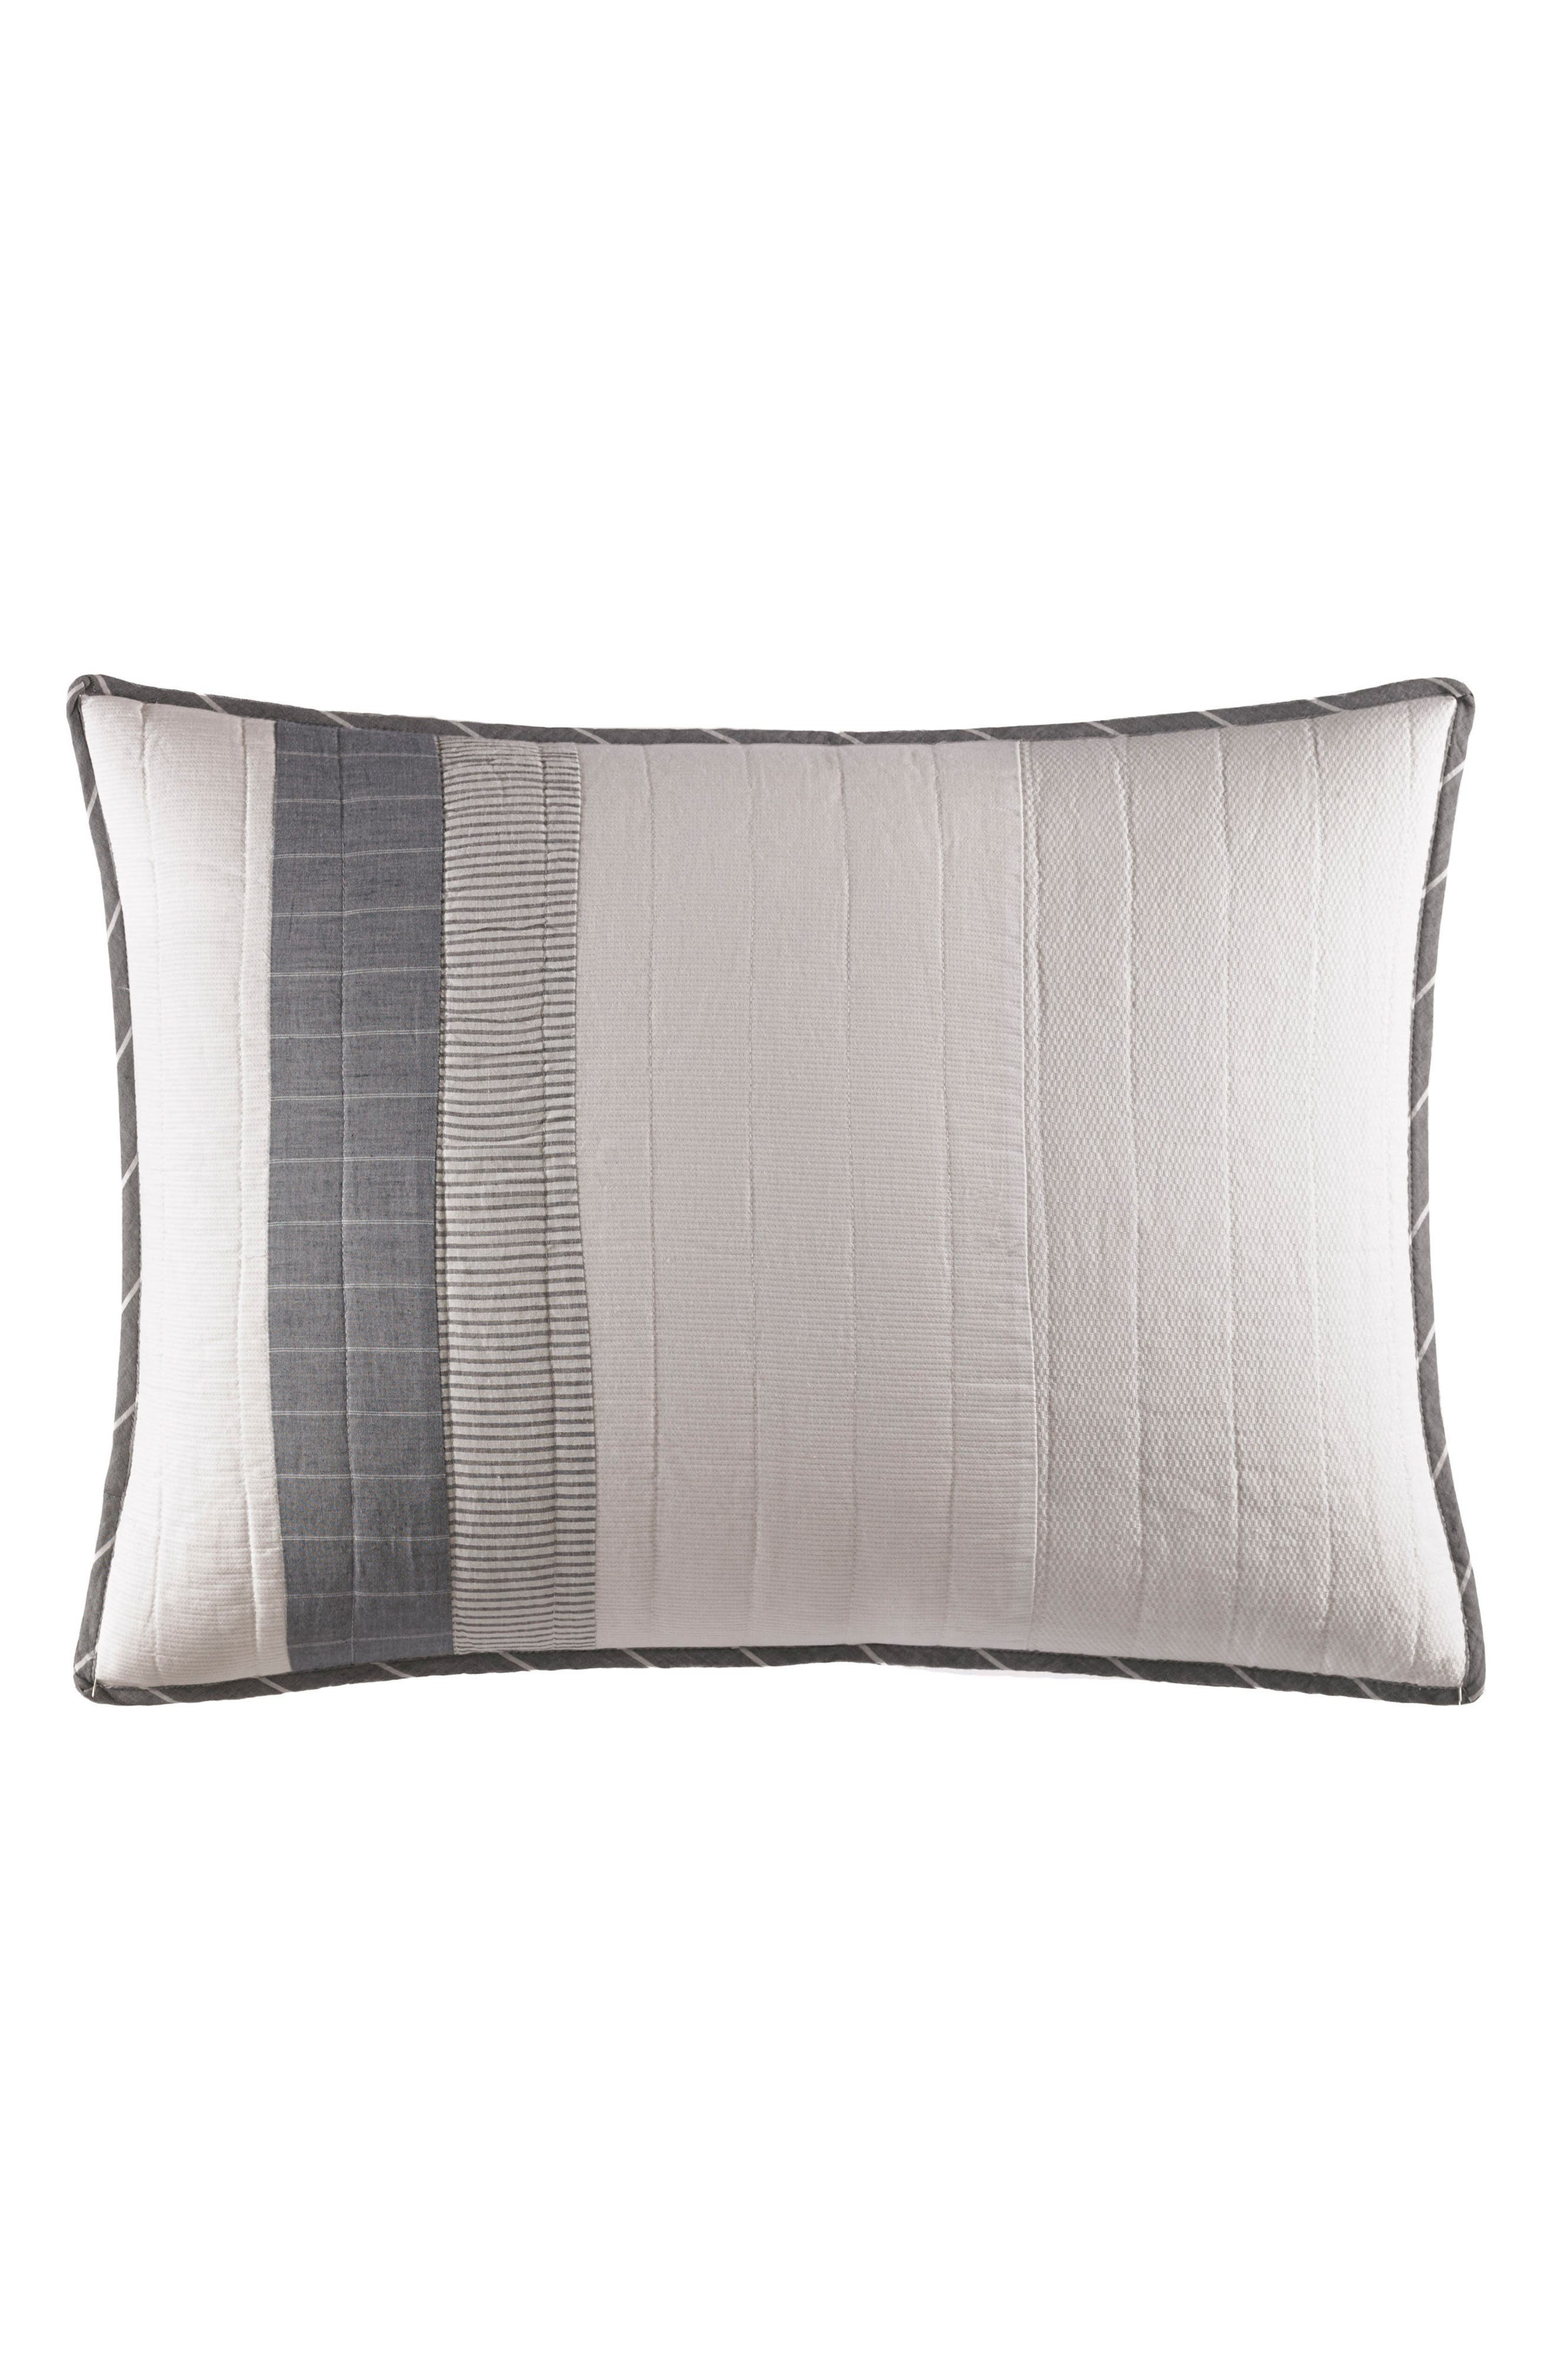 Calvert Standard Sham,                         Main,                         color, Grey